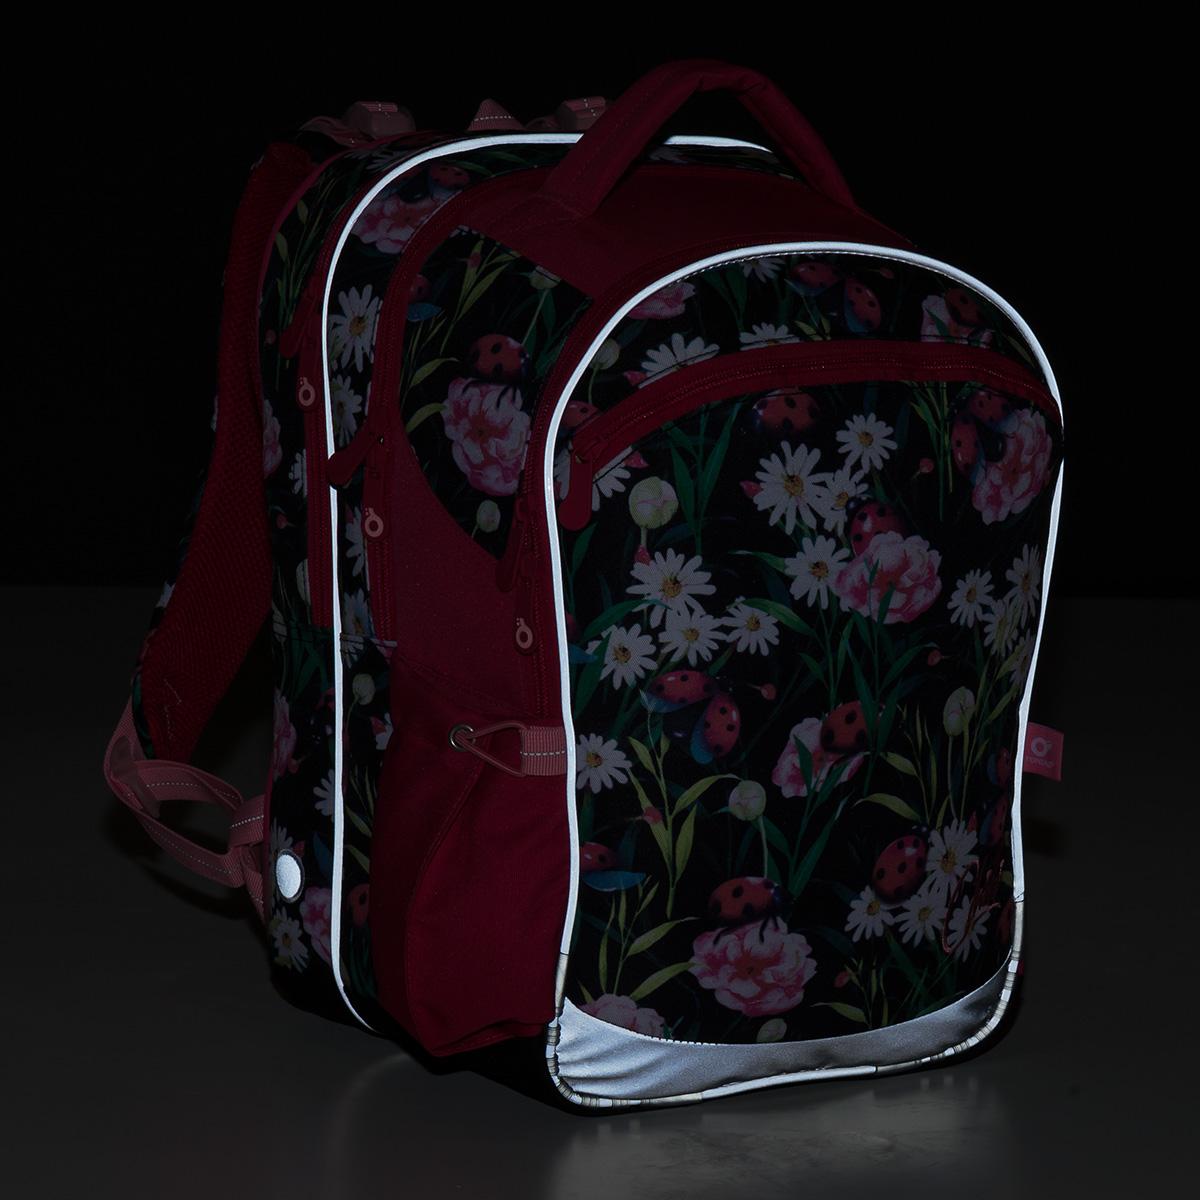 f85ad6d475a88 Plecak szkolny TOPGAL COCO 18004 G - Grajdomek